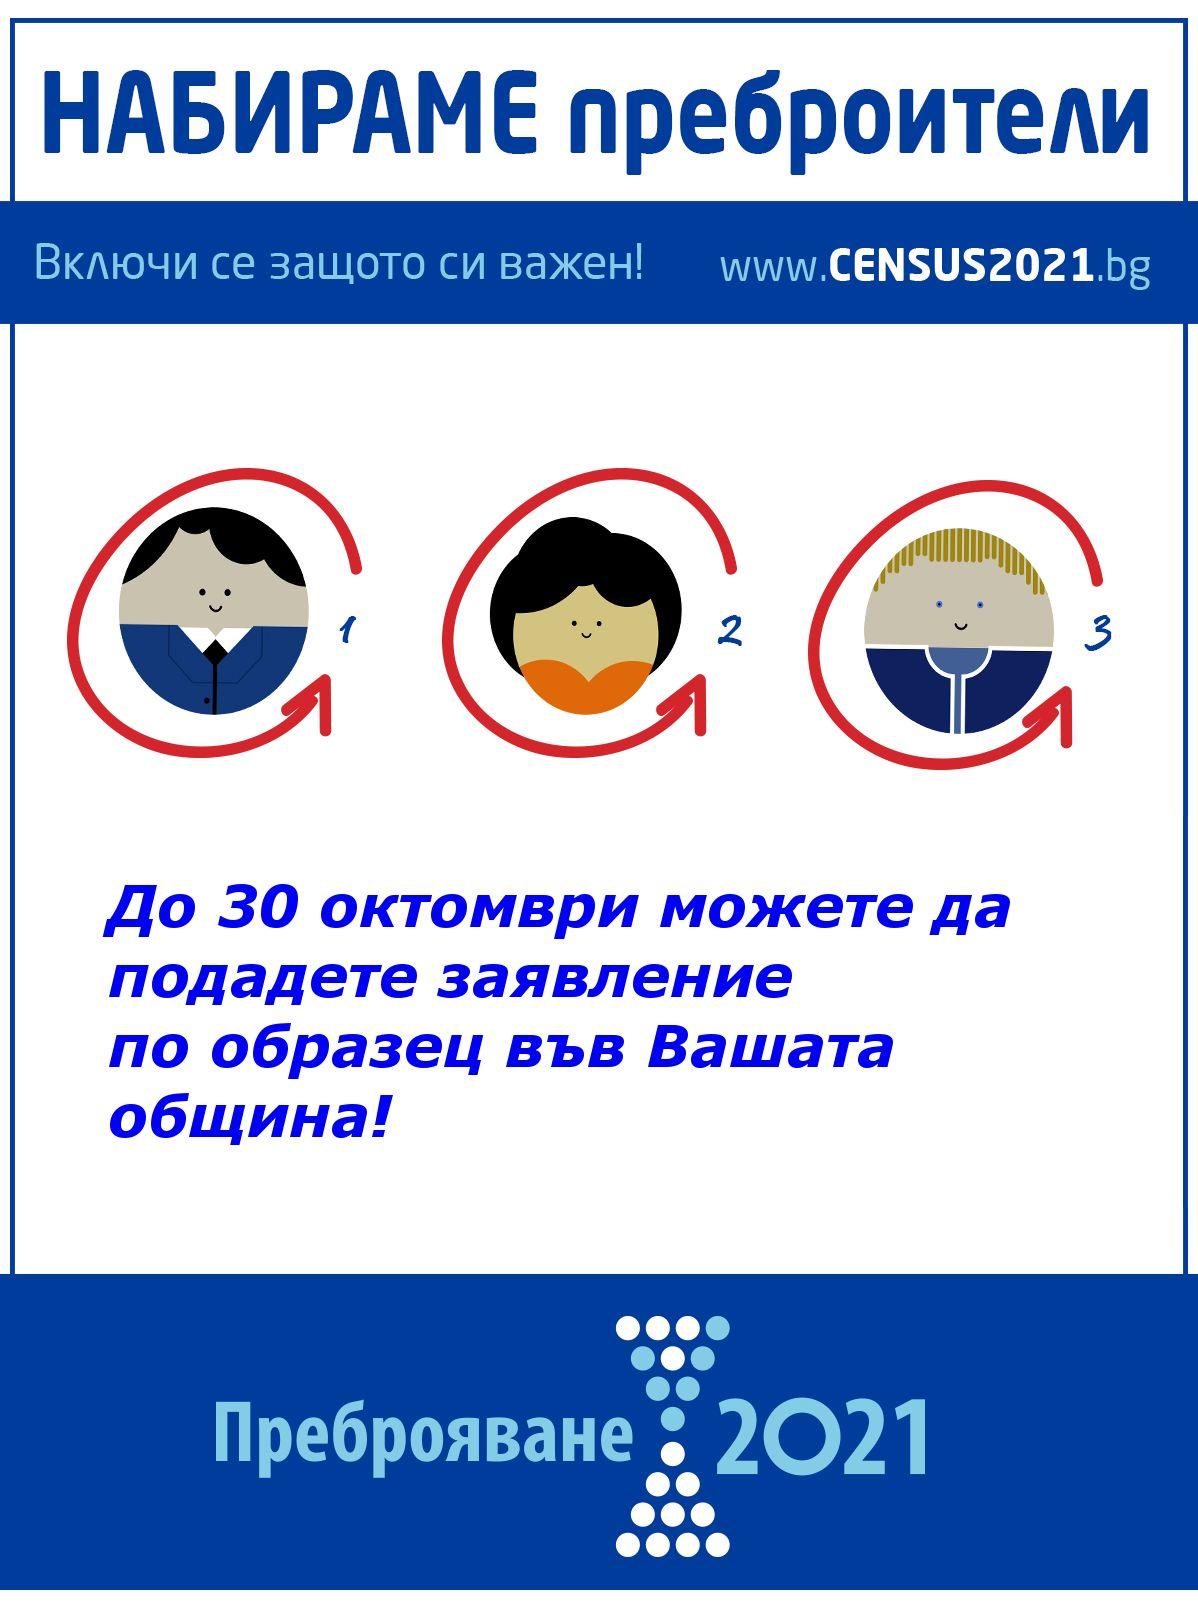 OBJAVA-2